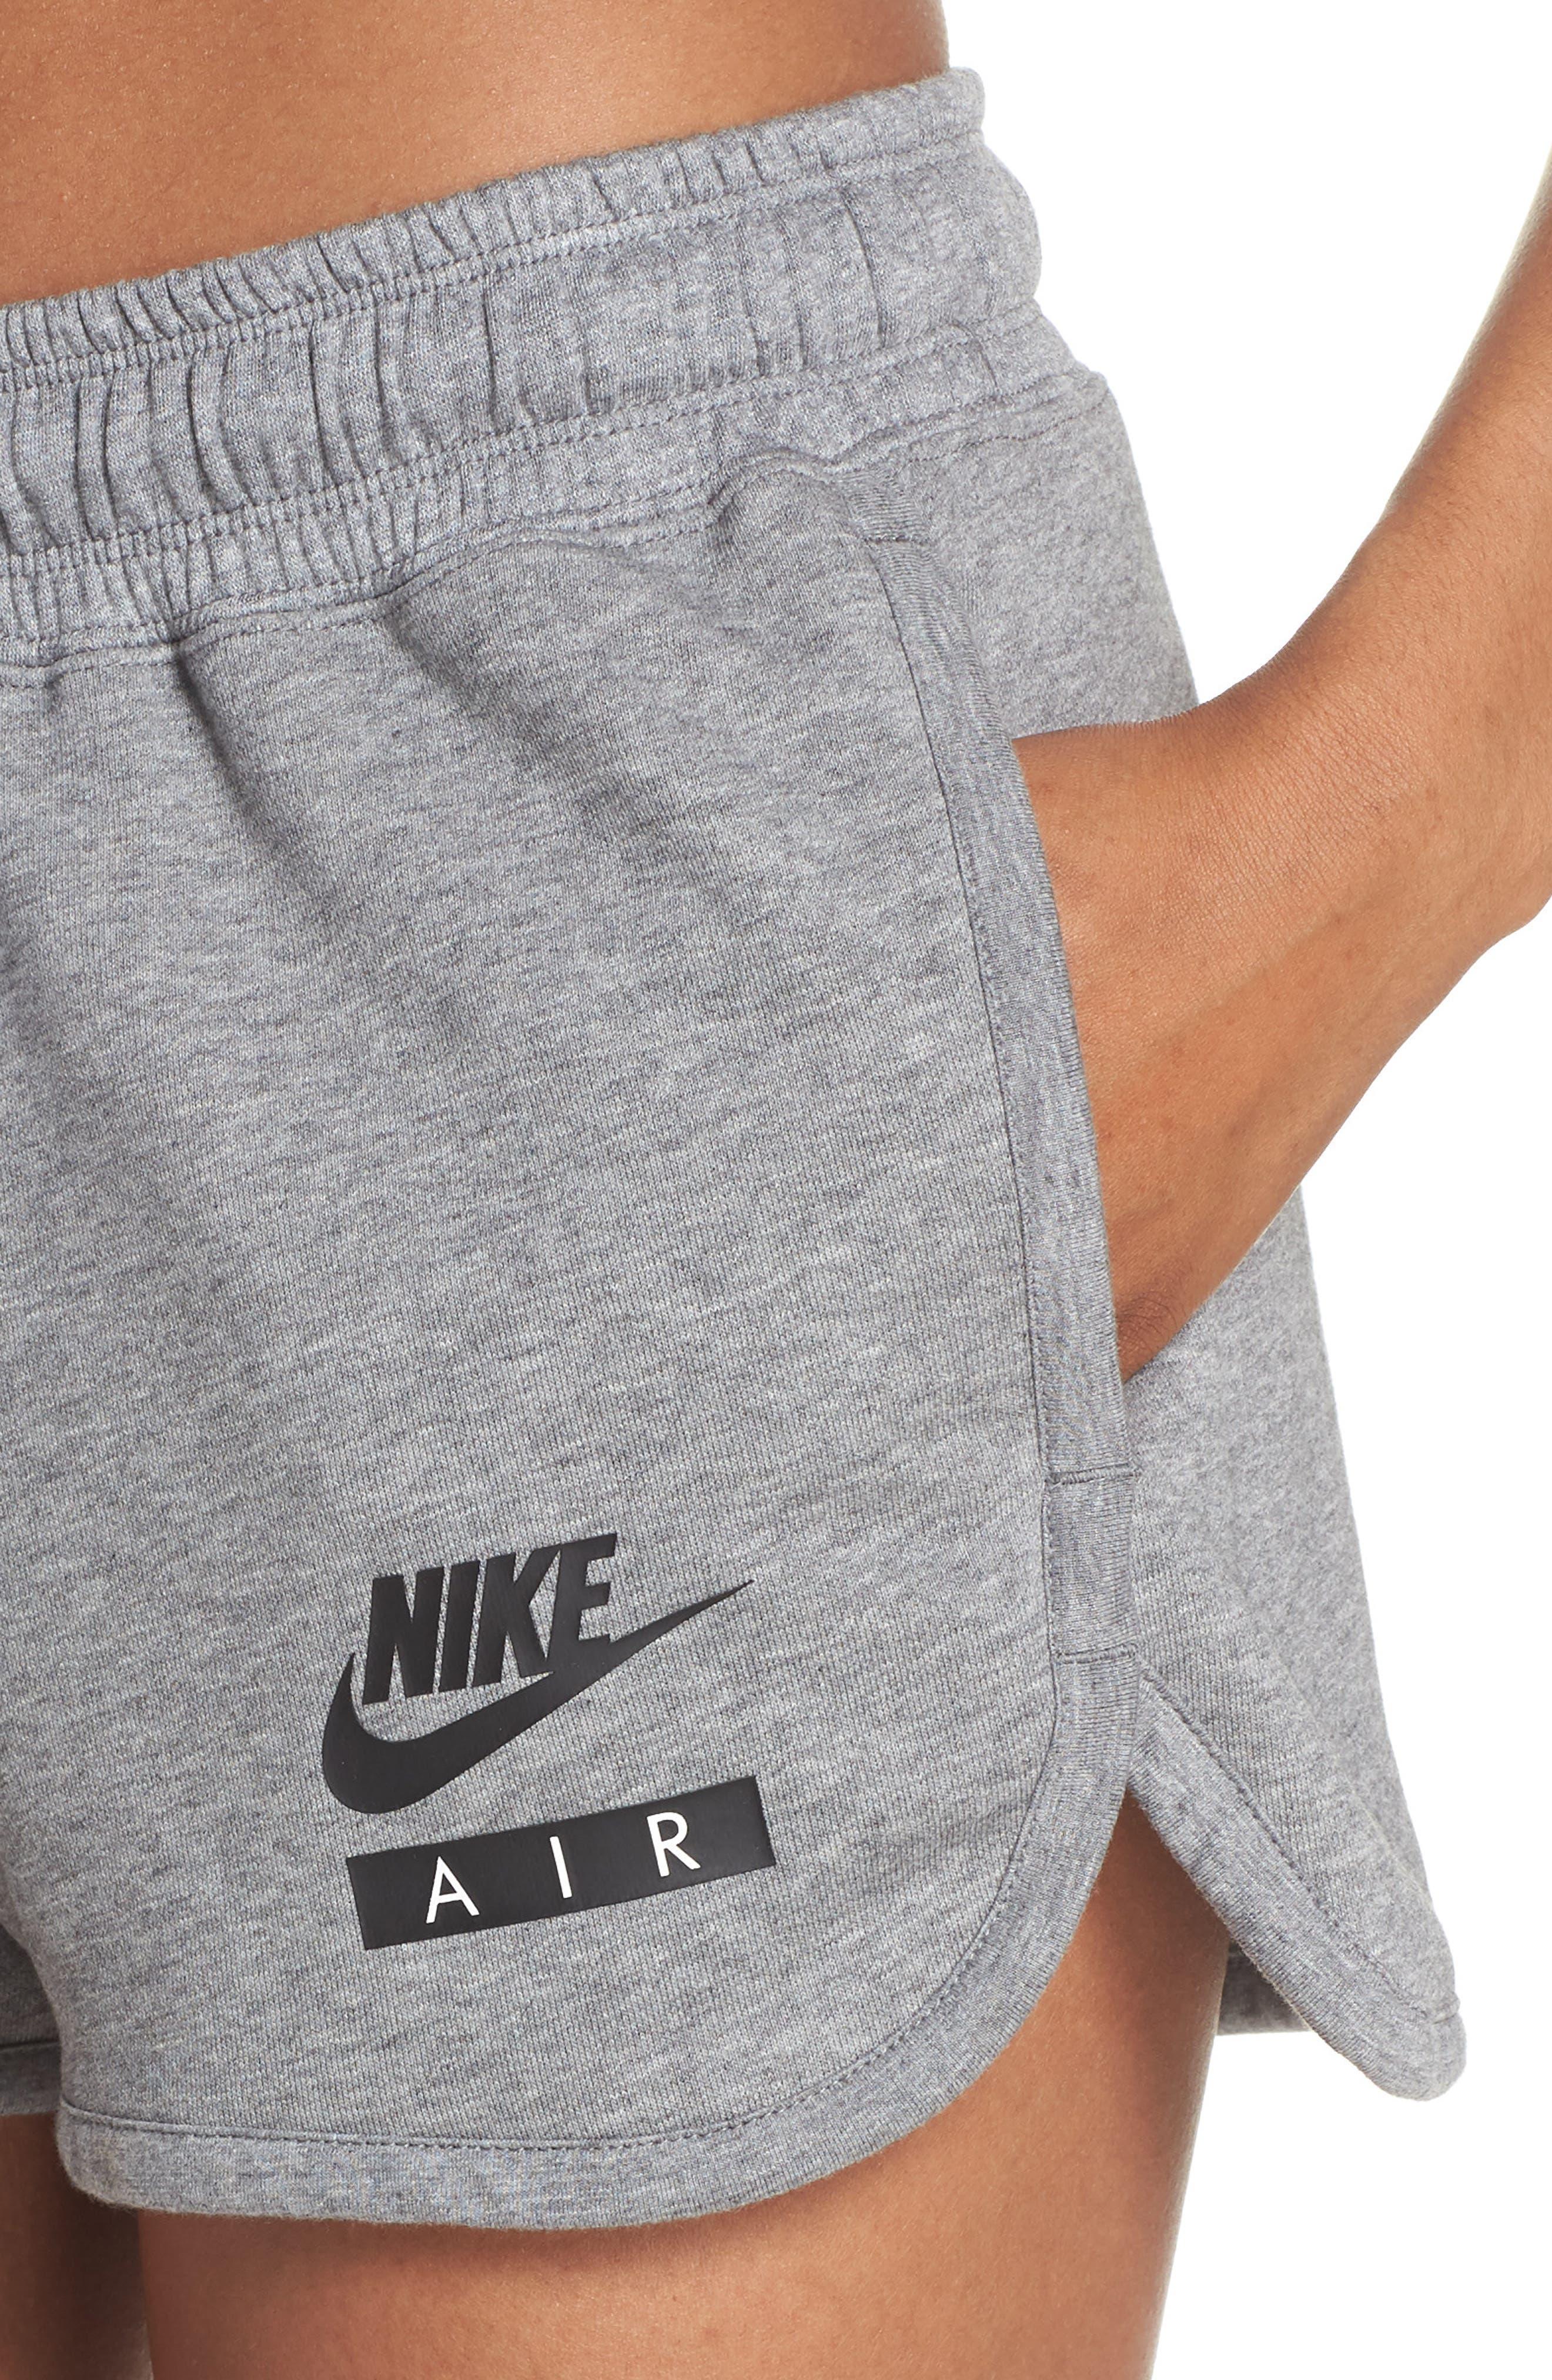 Sportswear Air Gym Shorts,                             Alternate thumbnail 4, color,                             Carbon Heather/ White/ Black